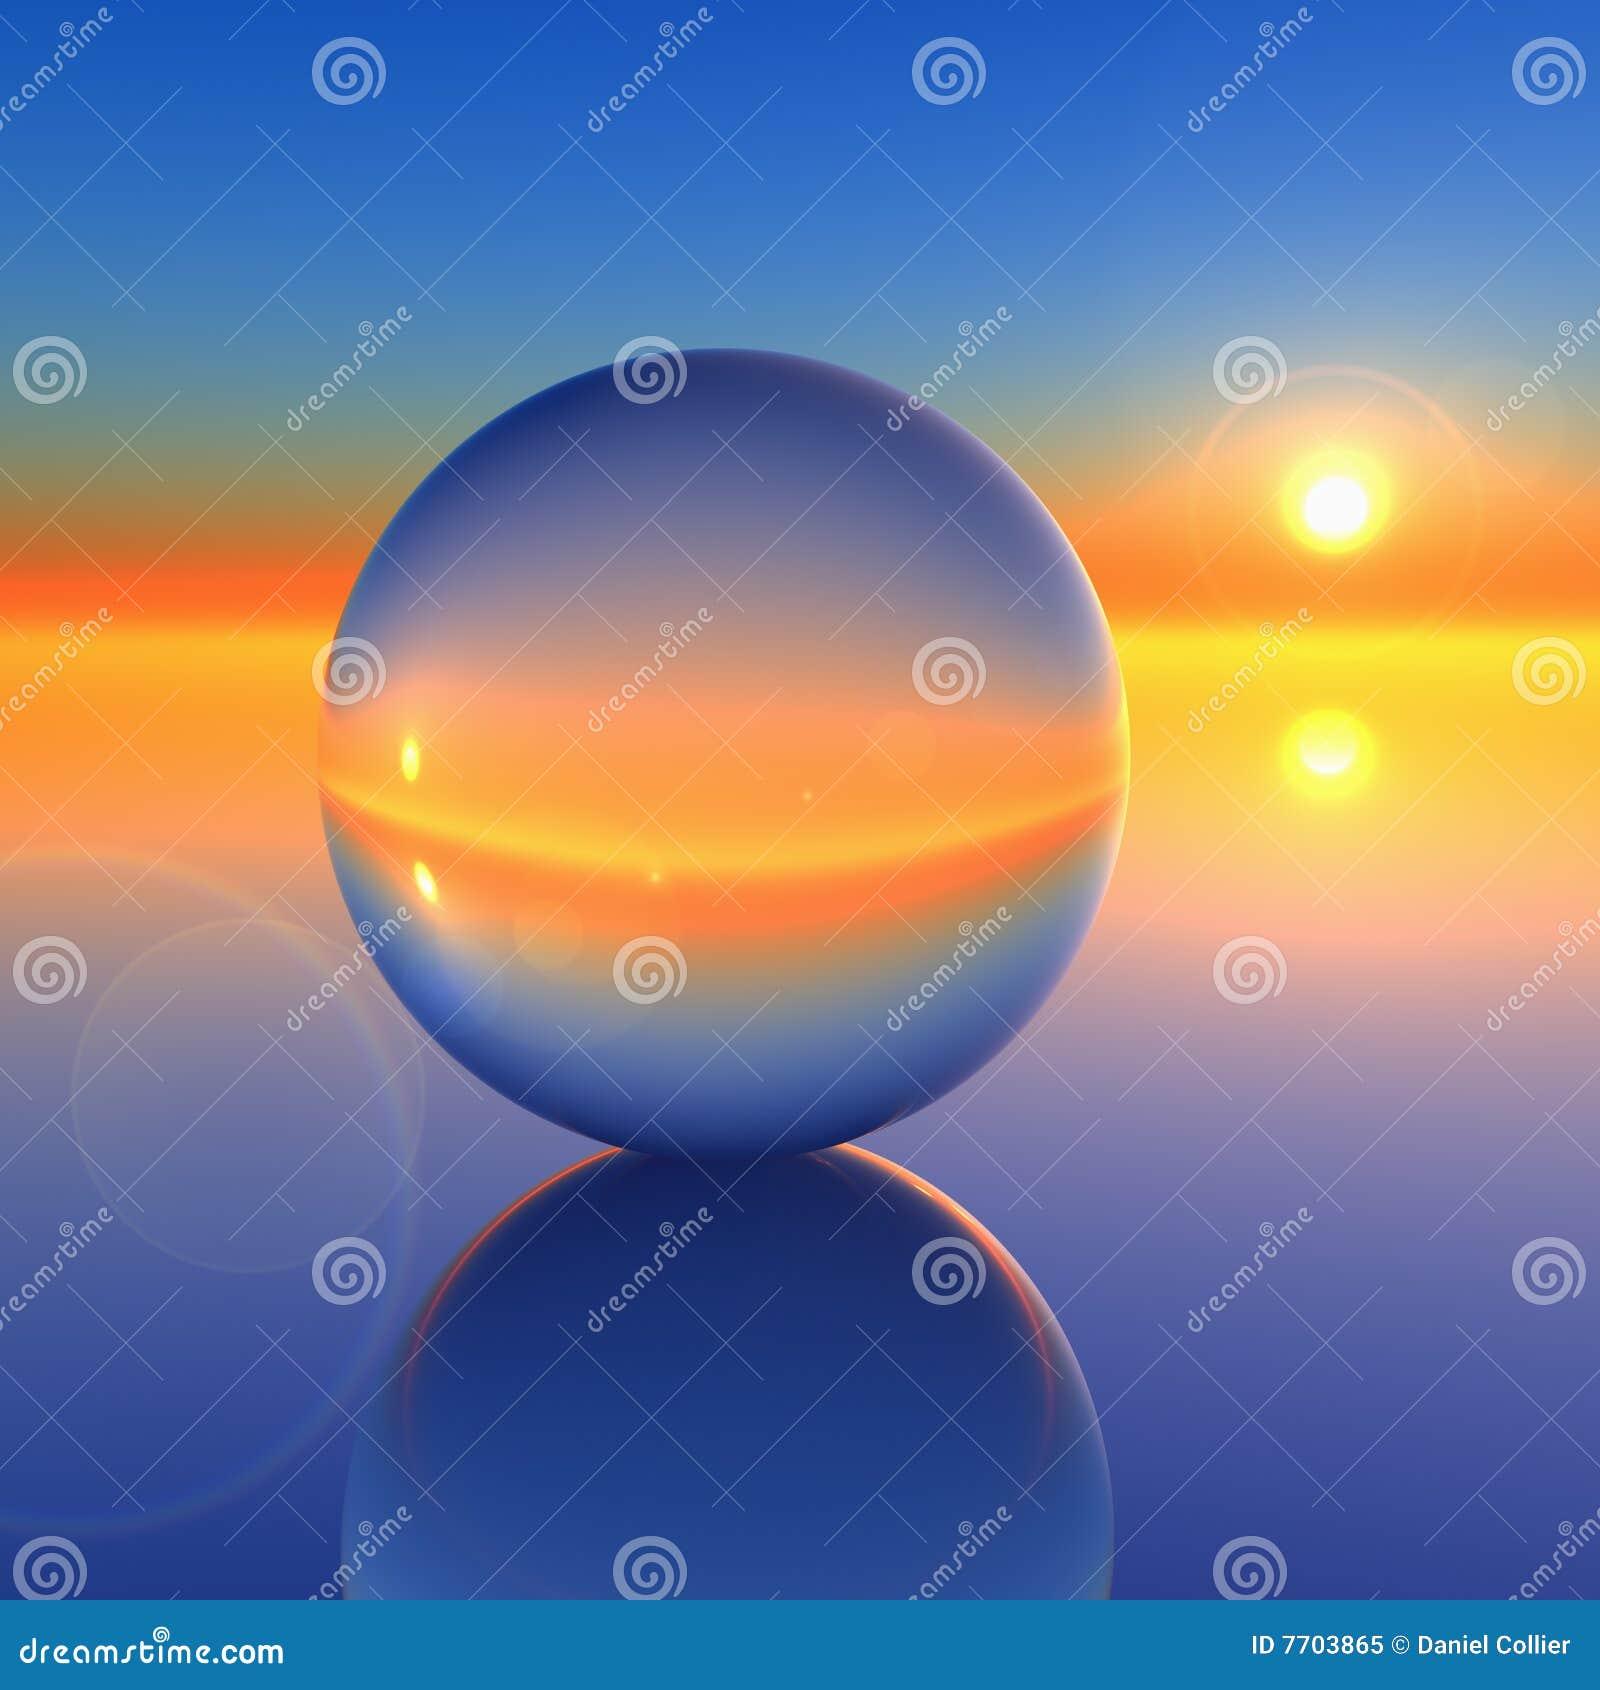 Abstract Crystal Ball on Future Horizon